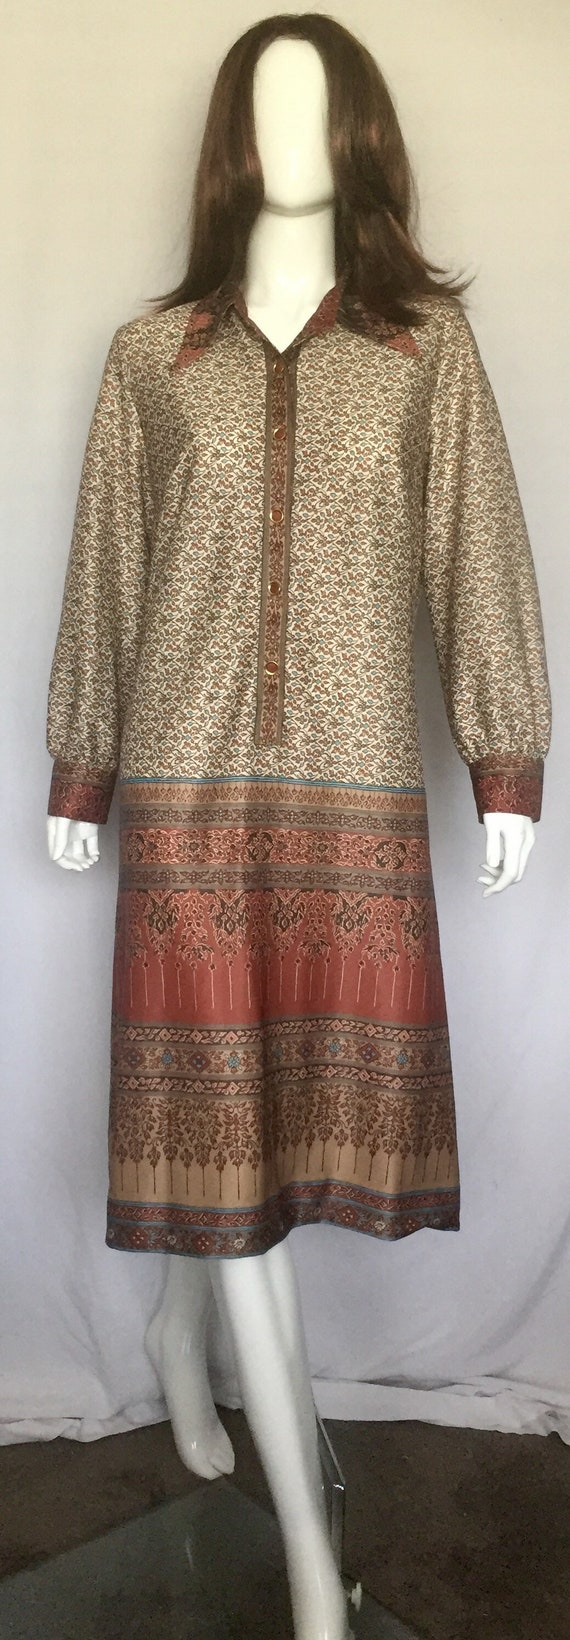 1970's Burnt Orange and Brown Shirt Dress - image 5